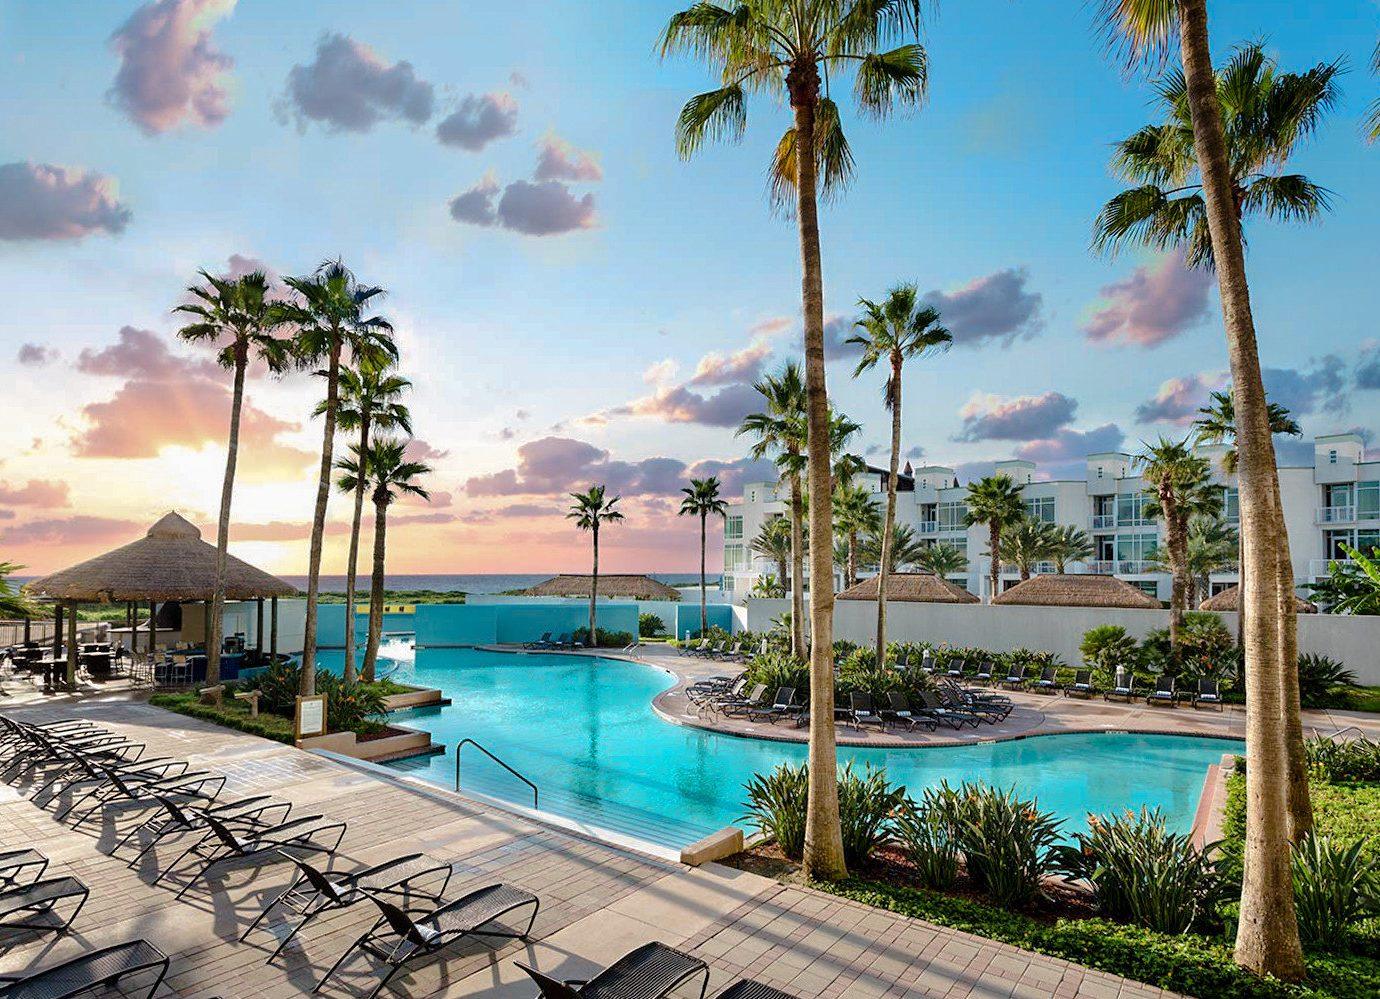 Trip Ideas tree sky outdoor palm leisure Resort property swimming pool vacation Beach caribbean estate arecales condominium Ocean bay Sea Lagoon marina lined shore area Garden several sandy